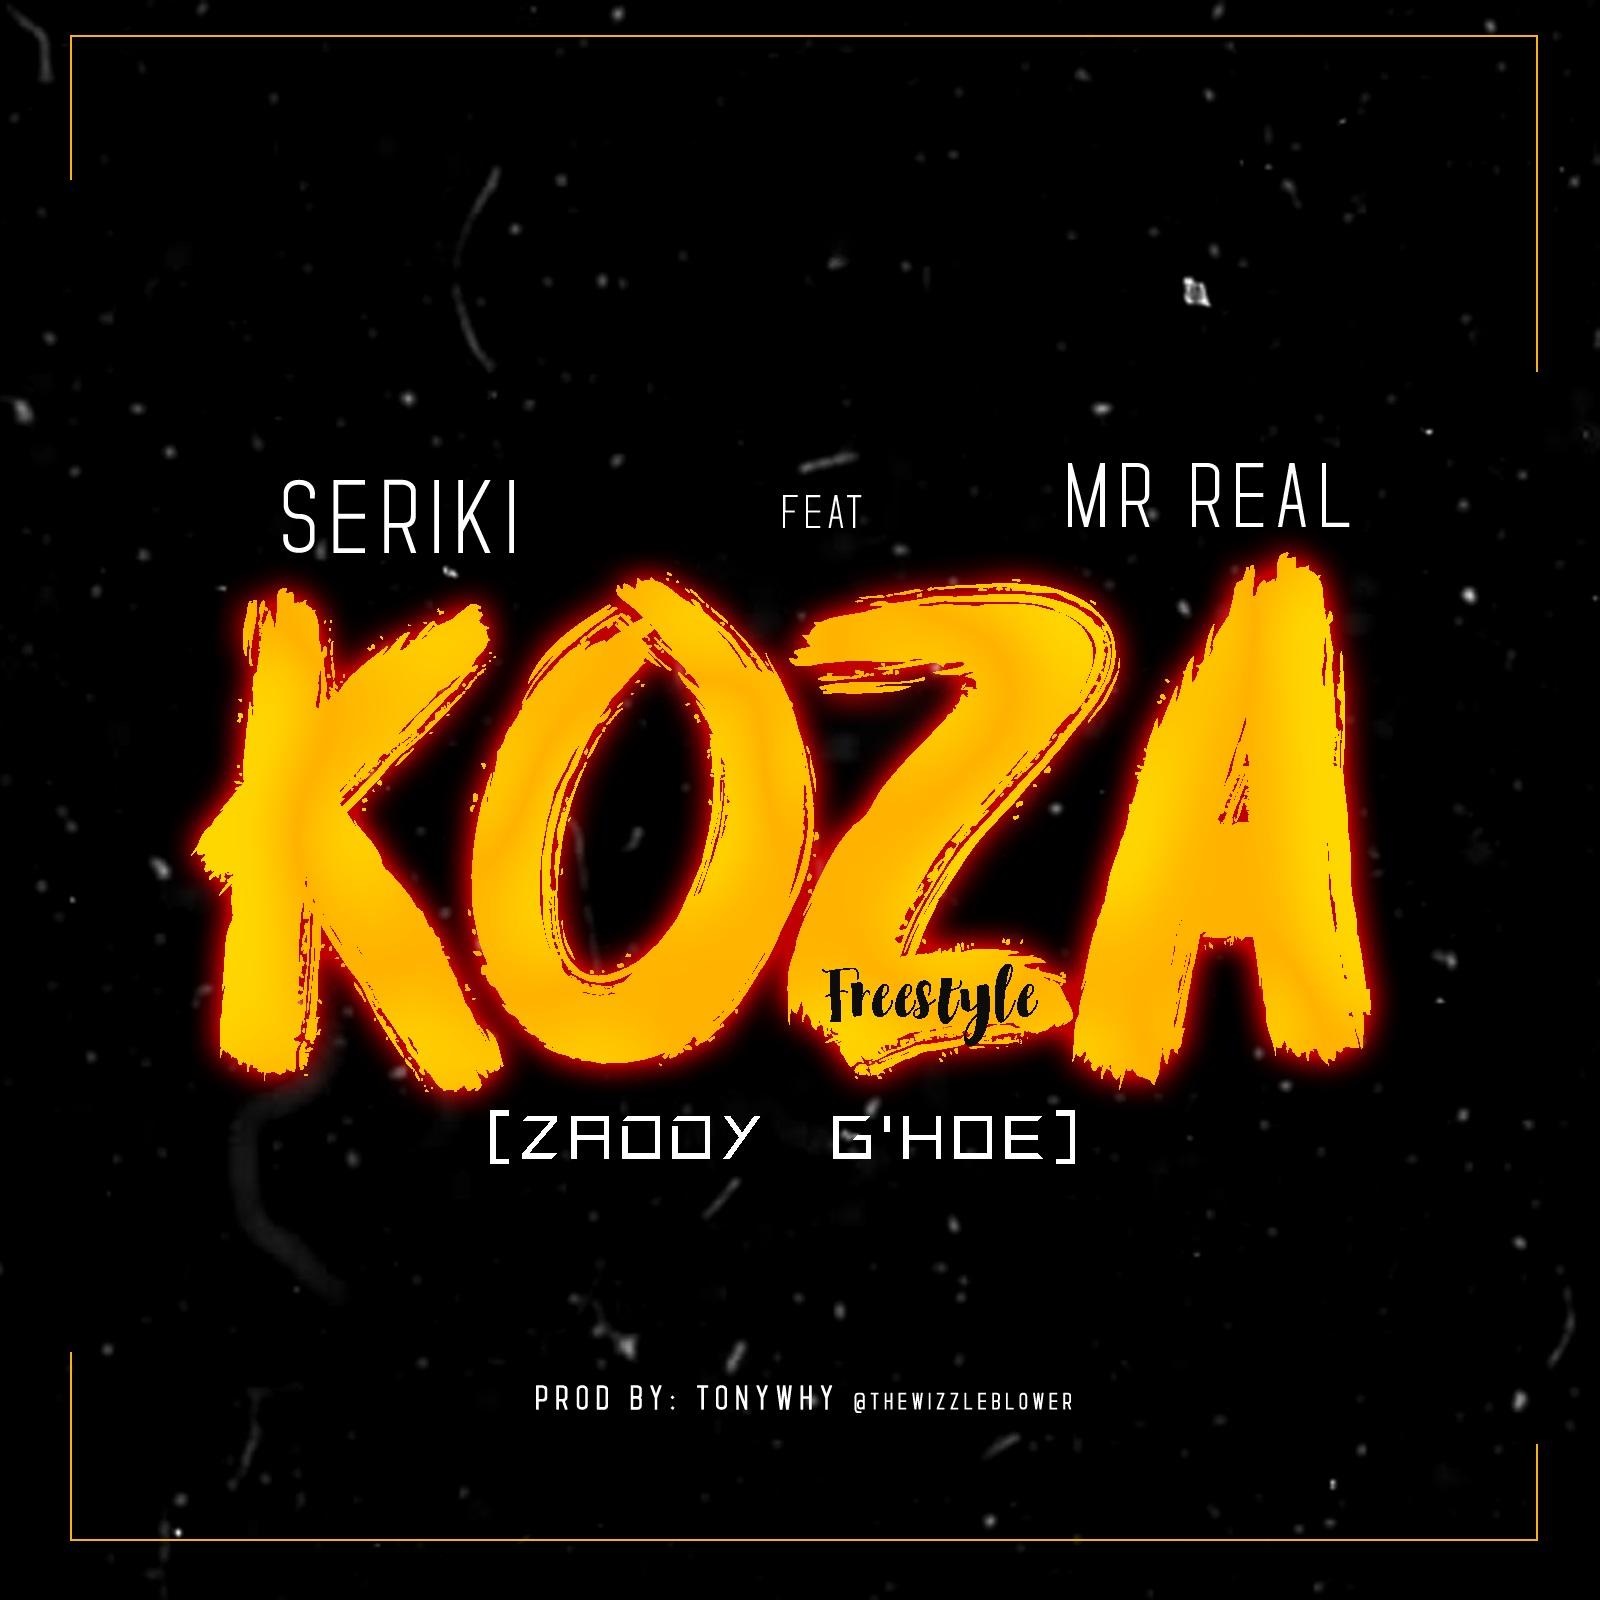 Seriki ft. Mr Real - Koza (Zaddy G'Hoe)